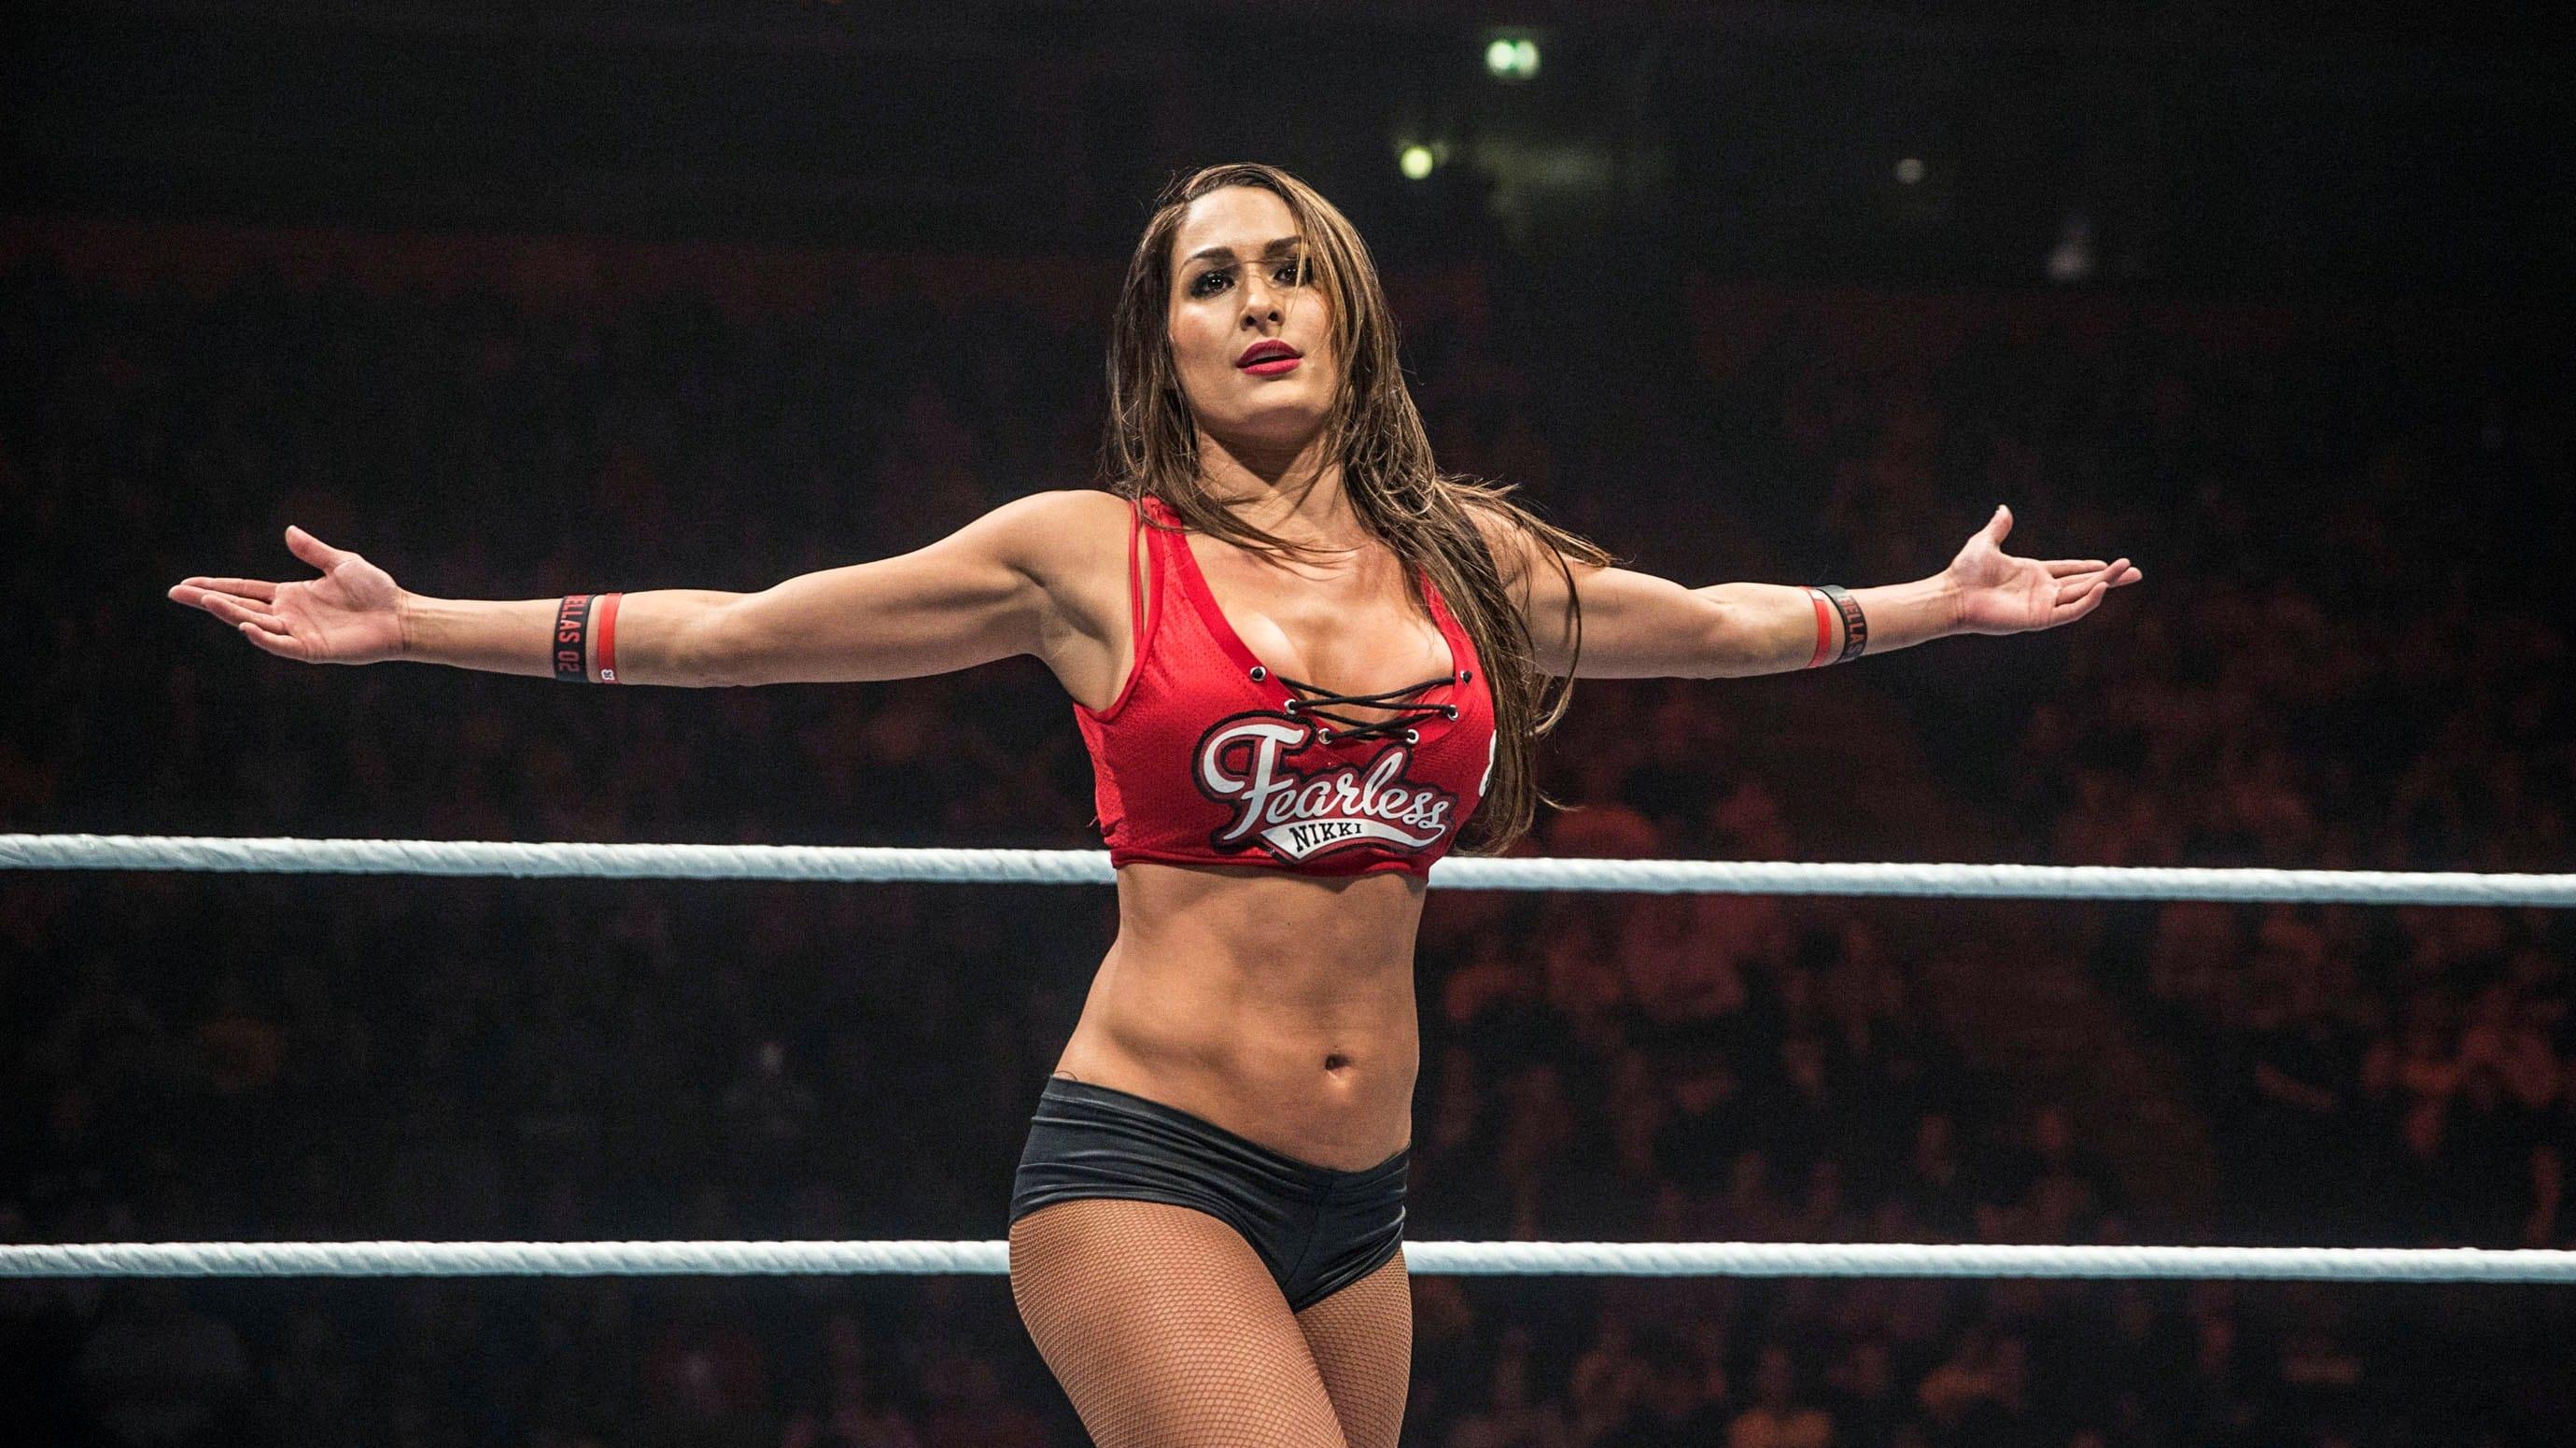 John Cena And Nikki Bella Ring